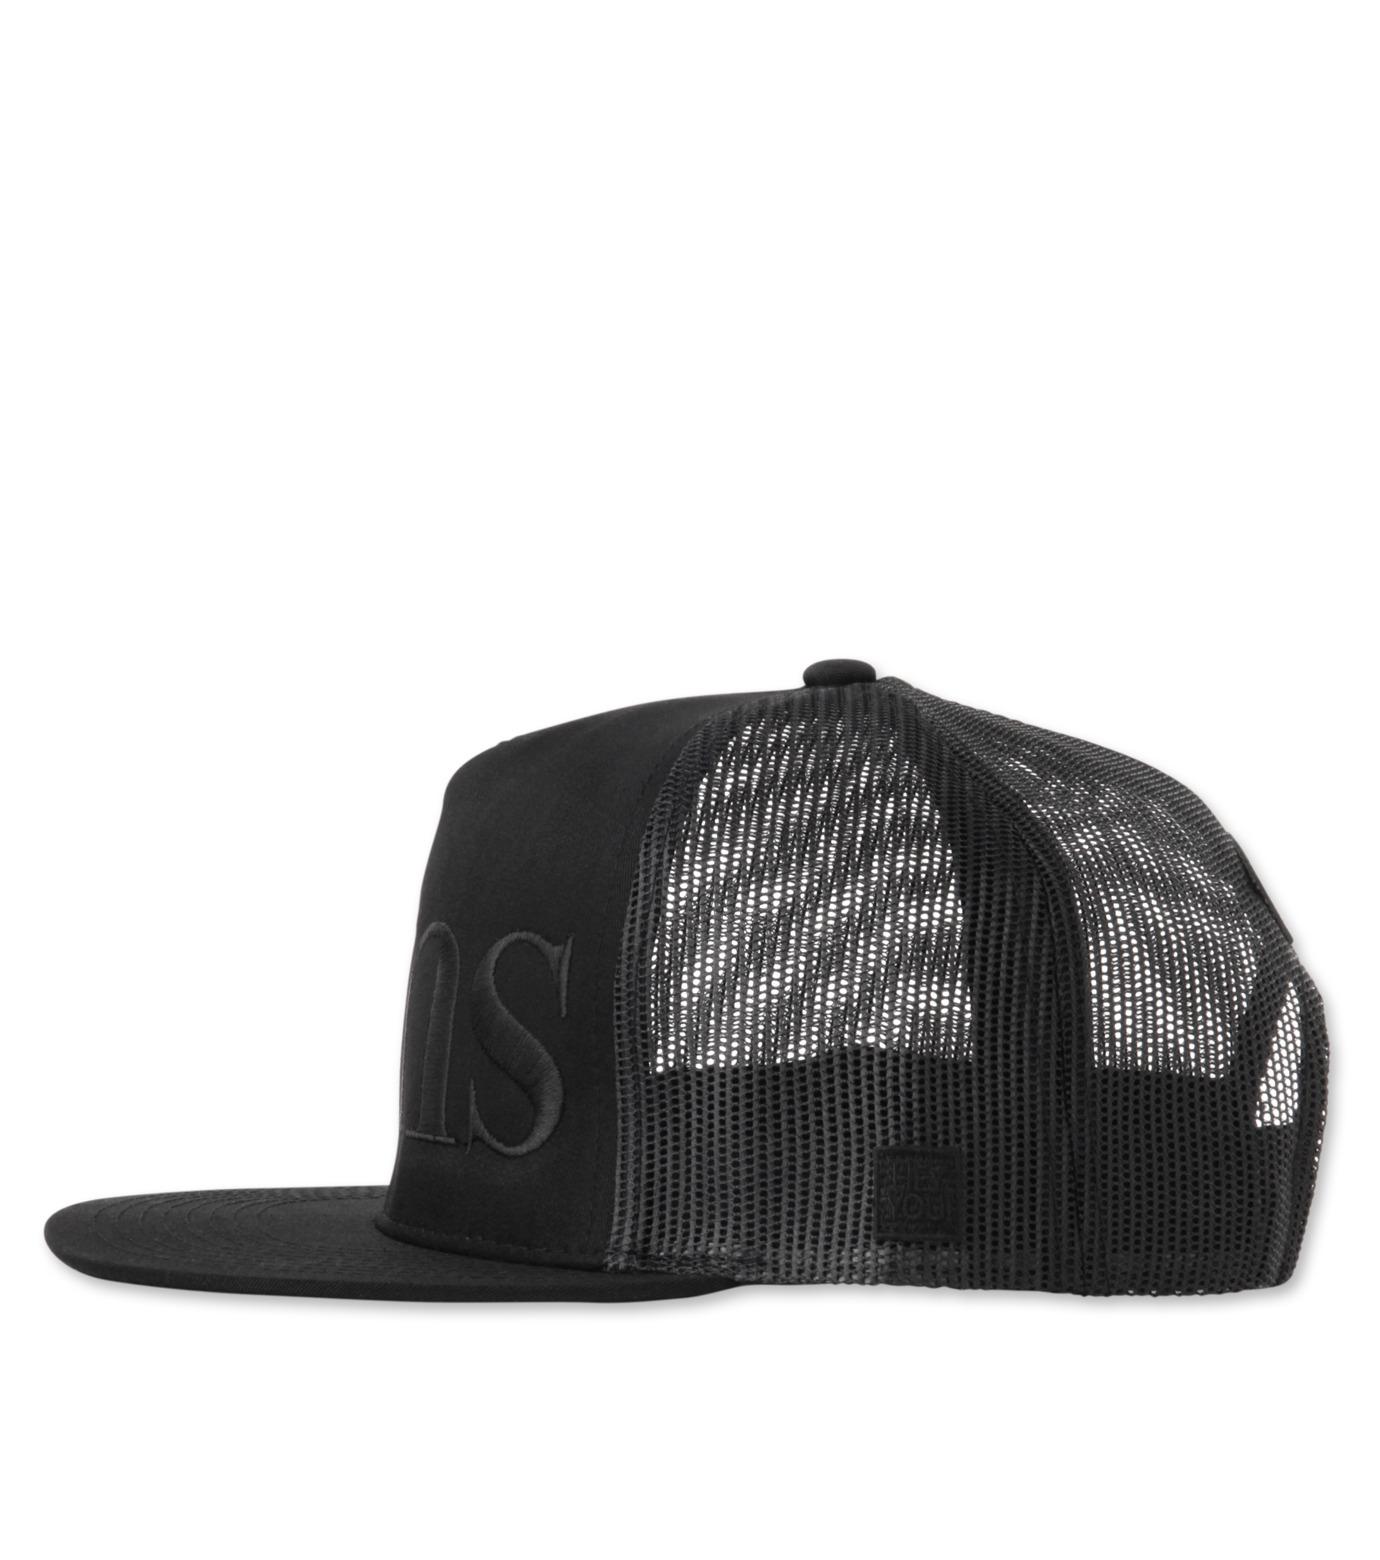 HEY YOU !(ヘイユウ)のSURF Mesh CAP-BLACK(キャップ/cap)-Surf-Cap2 拡大詳細画像2